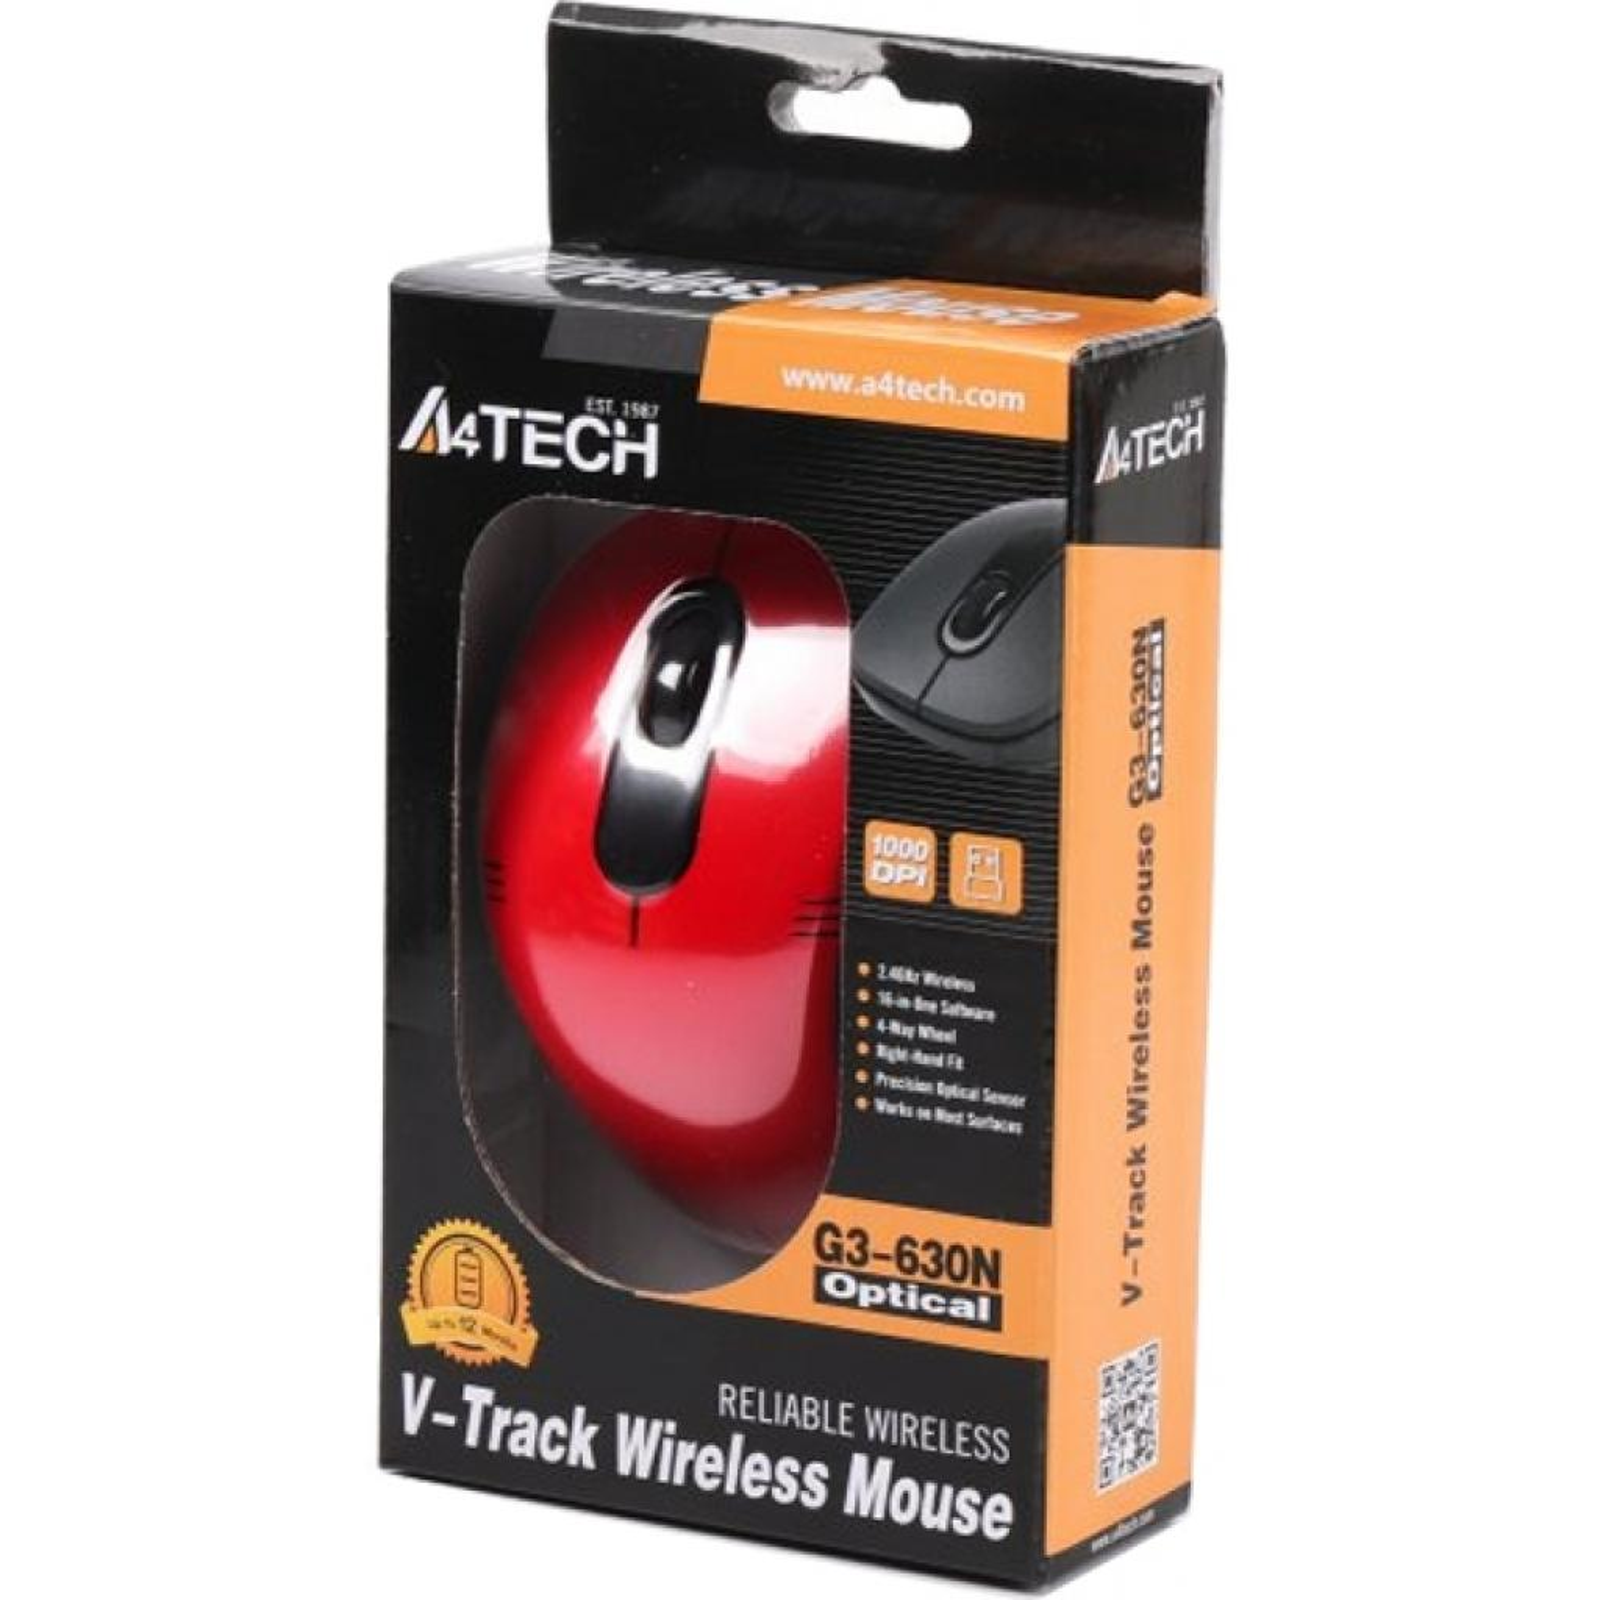 Мышка A4Tech G3-630N Black изображение 5